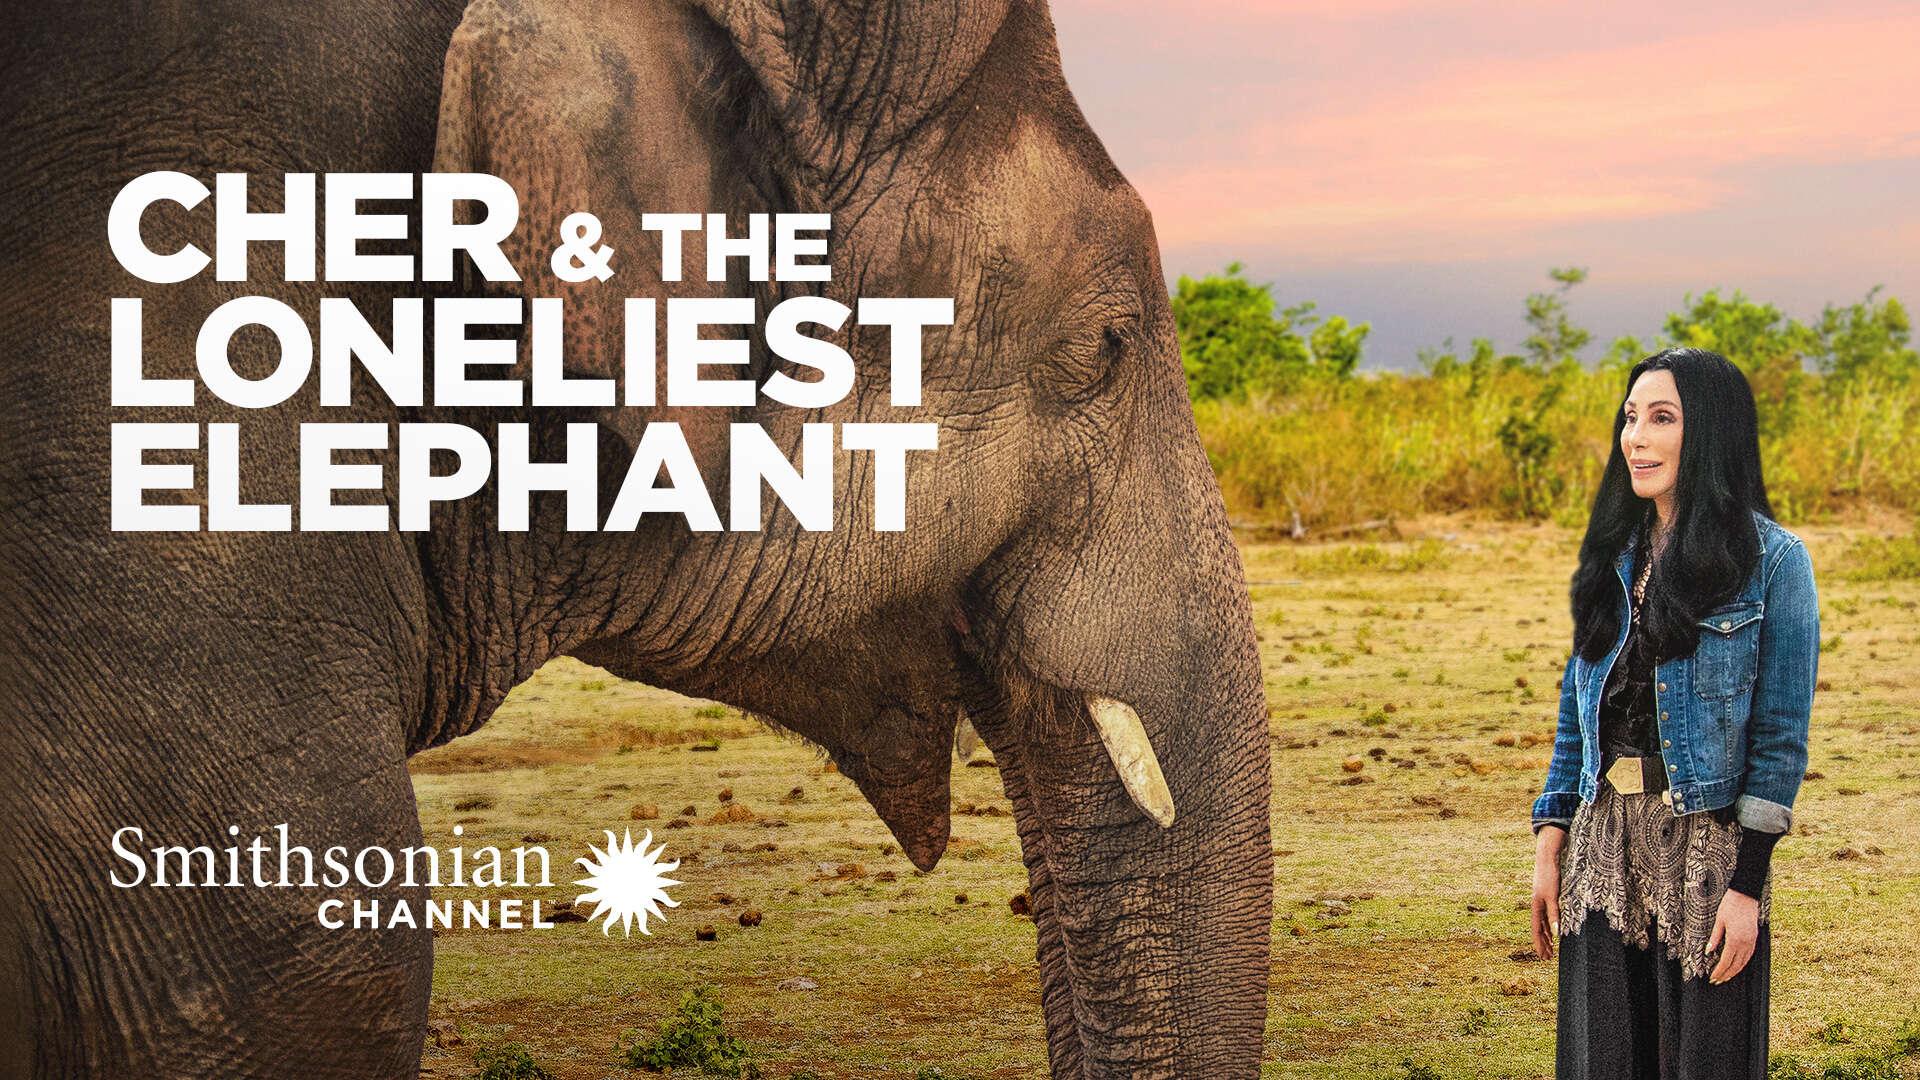 Cher & the Loneliest Elephant